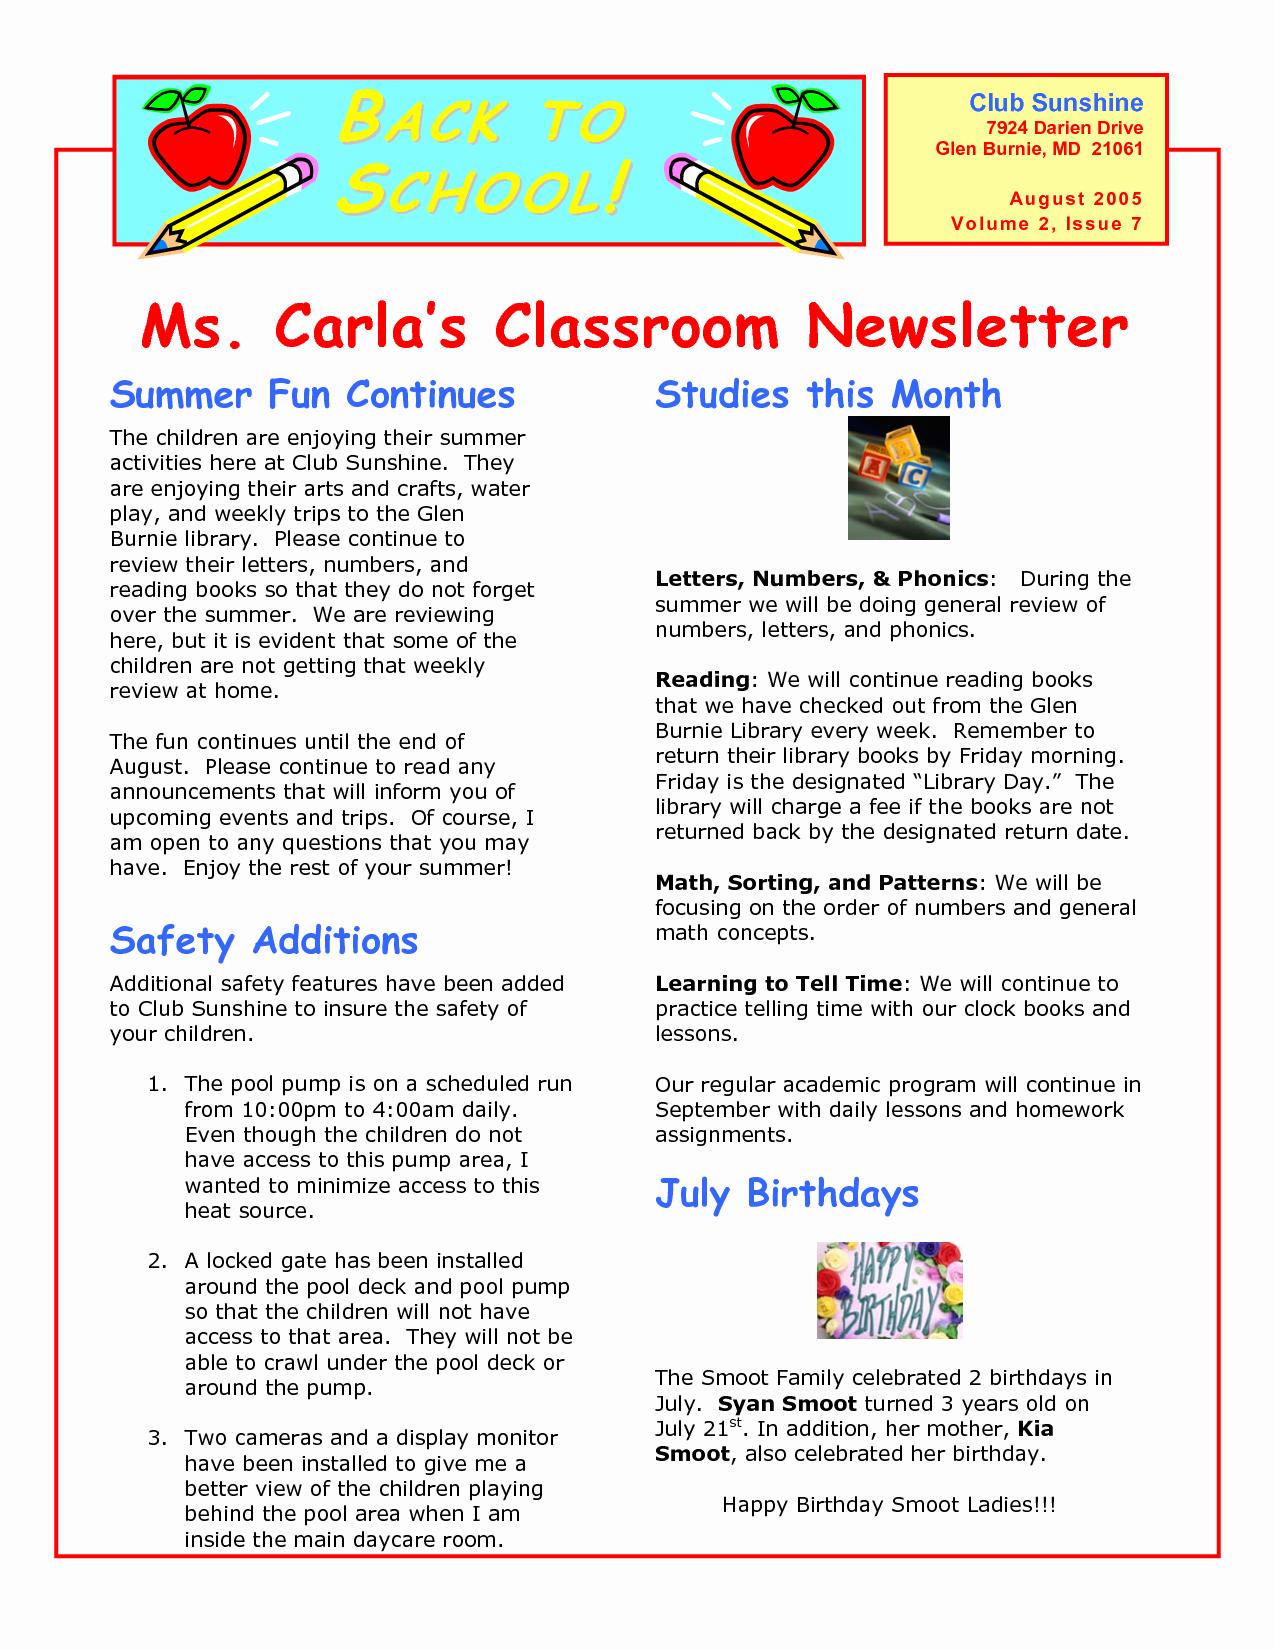 Elementary Classroom Newsletter Template Luxury Classroom Newsletter Templates Wallpapersupnet Xbedd3os